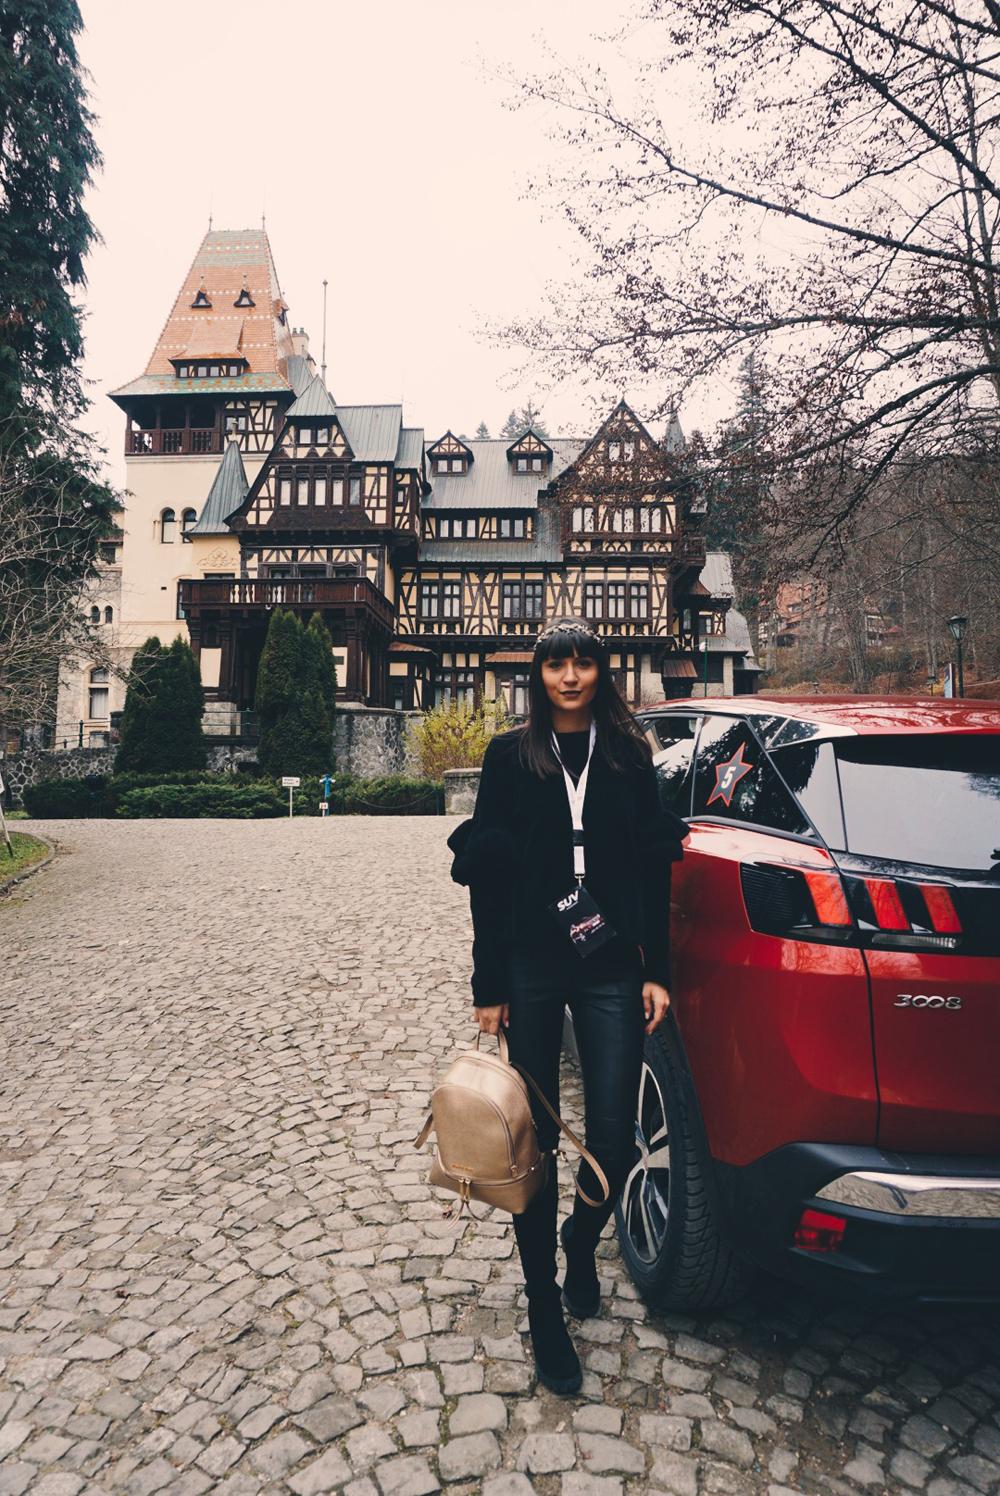 Sandra Bucharest Love Hotels